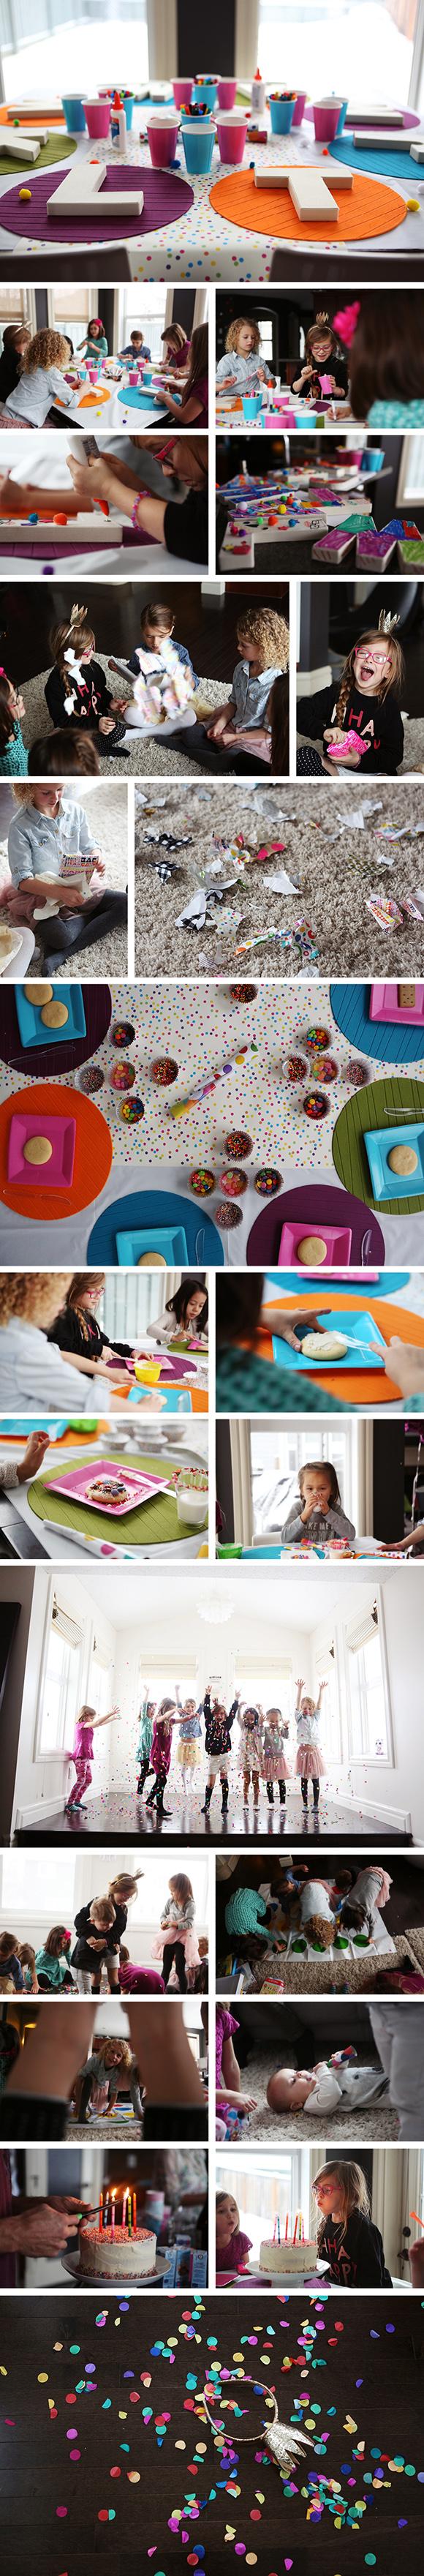 lilas-confetti-birthday-party-2